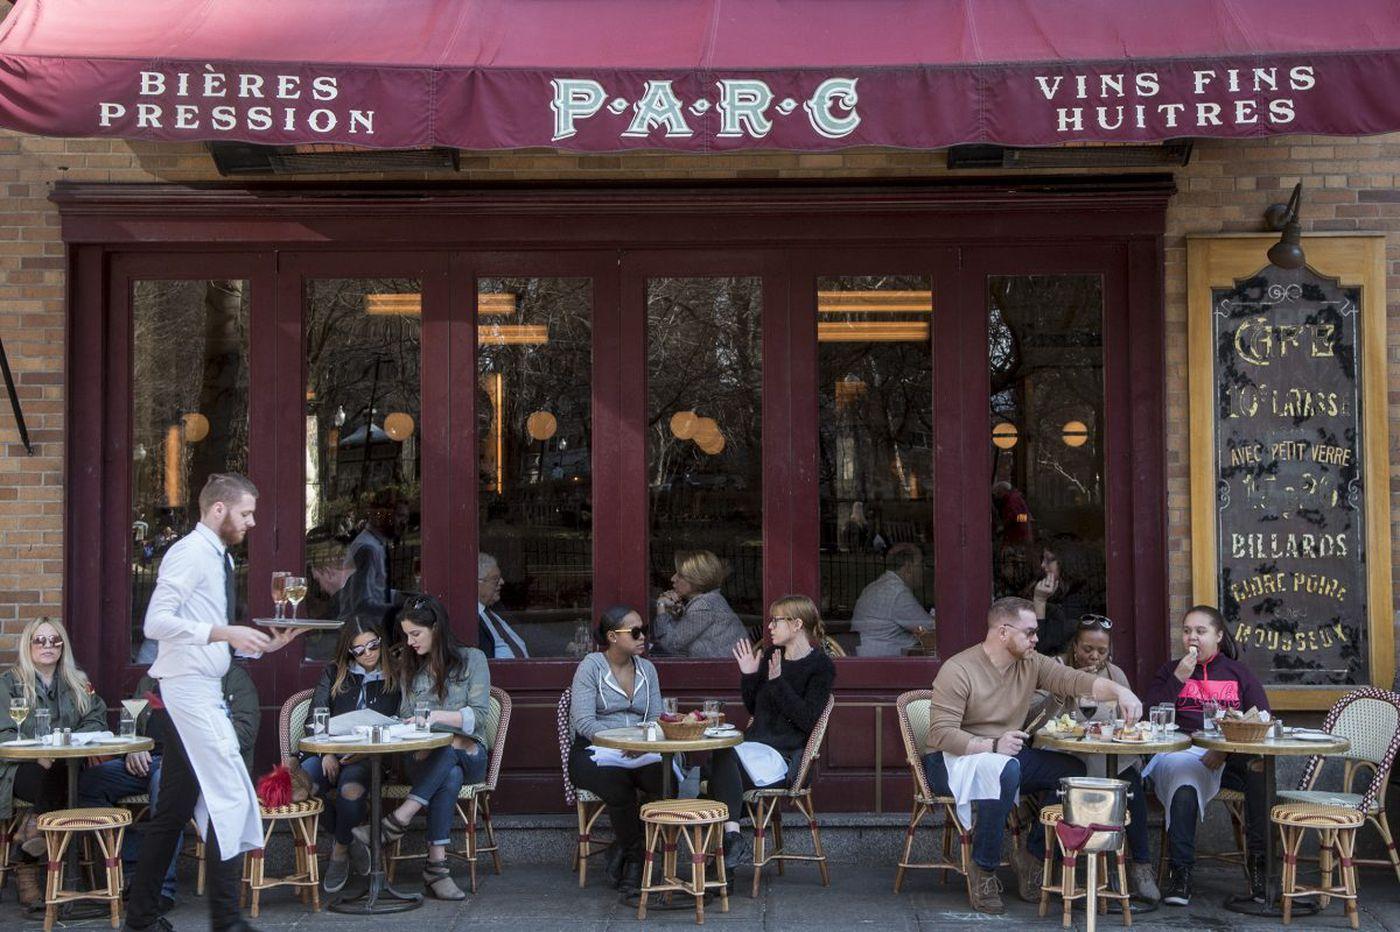 Waiter wars: Parc, Zahav restaurants tripped up by tips